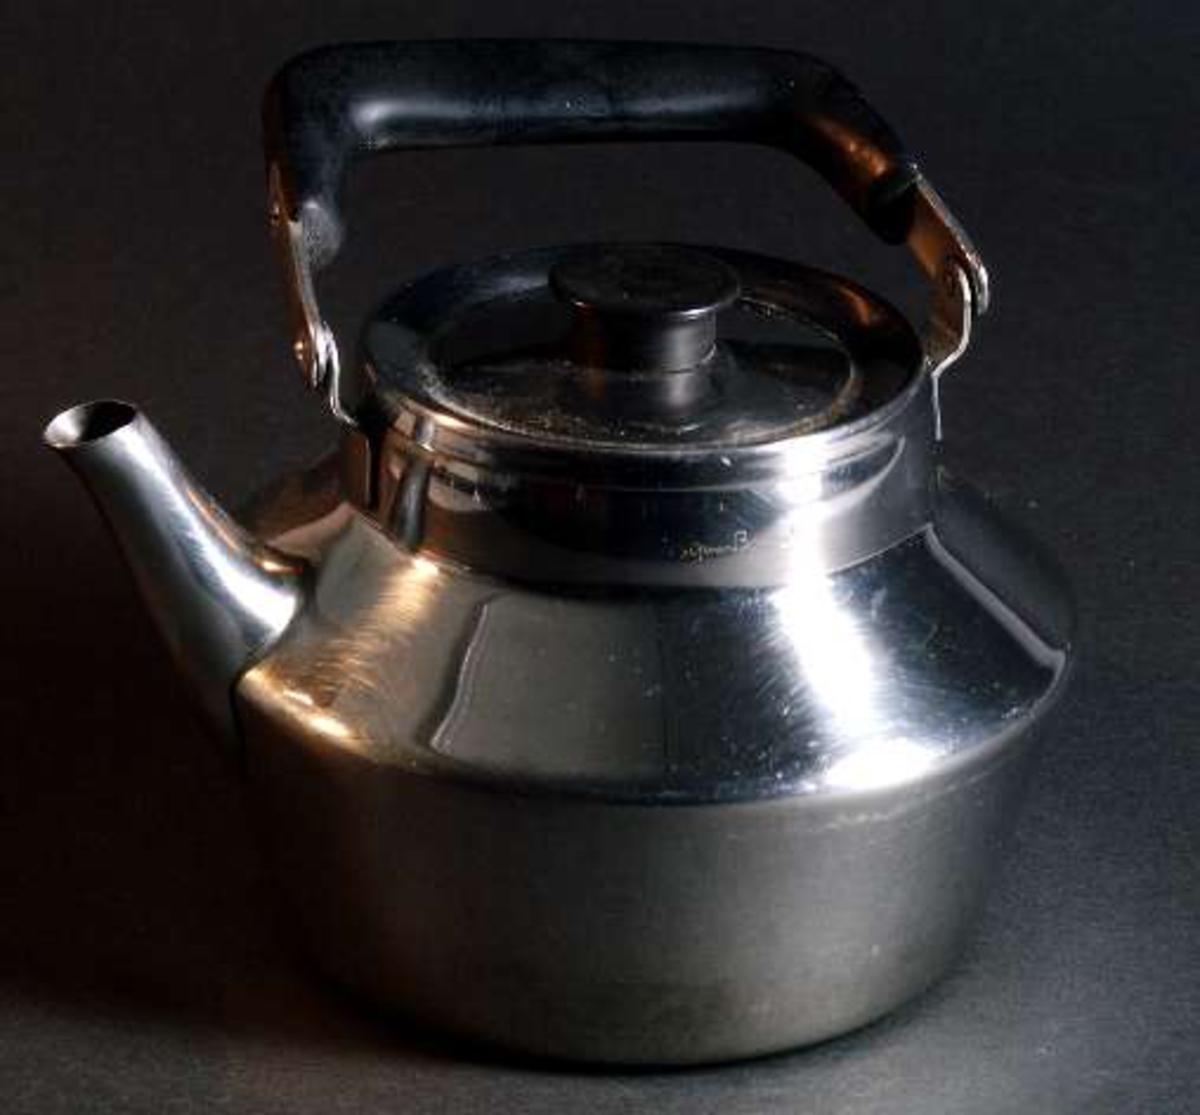 Kaffepanna   upplandsmuseet / digitaltmuseum